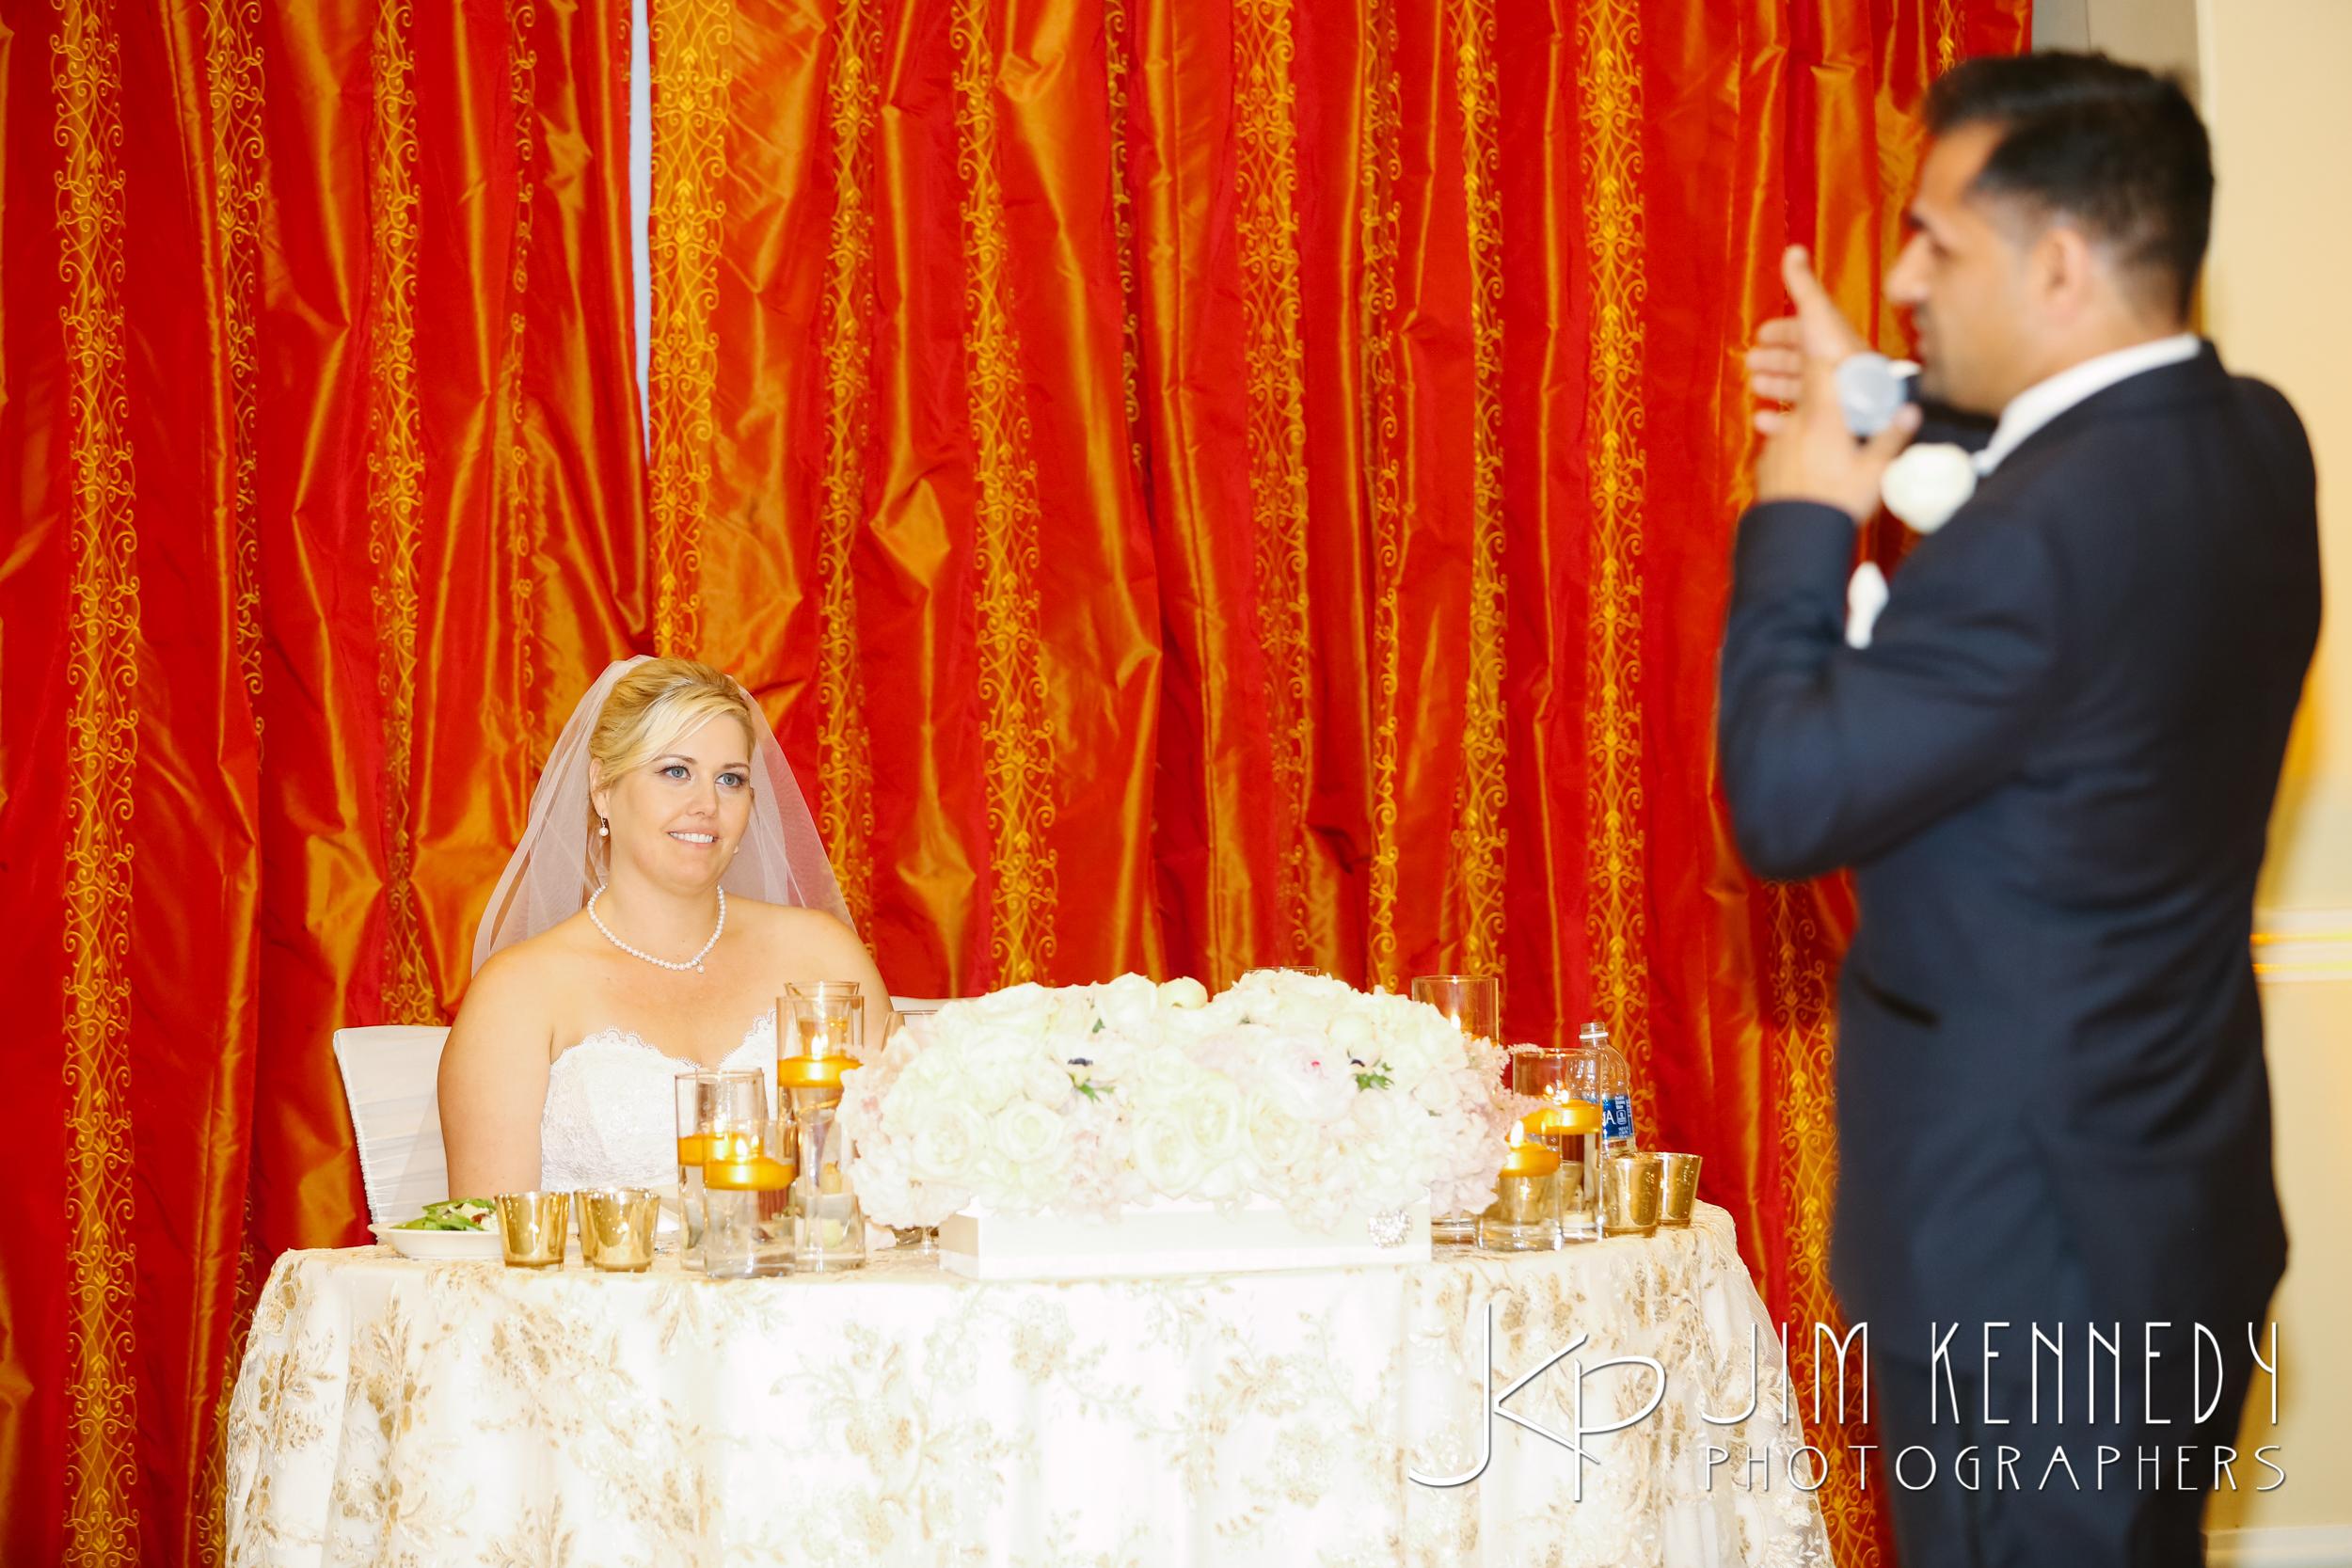 huntington-beach-wedding-159.JPG